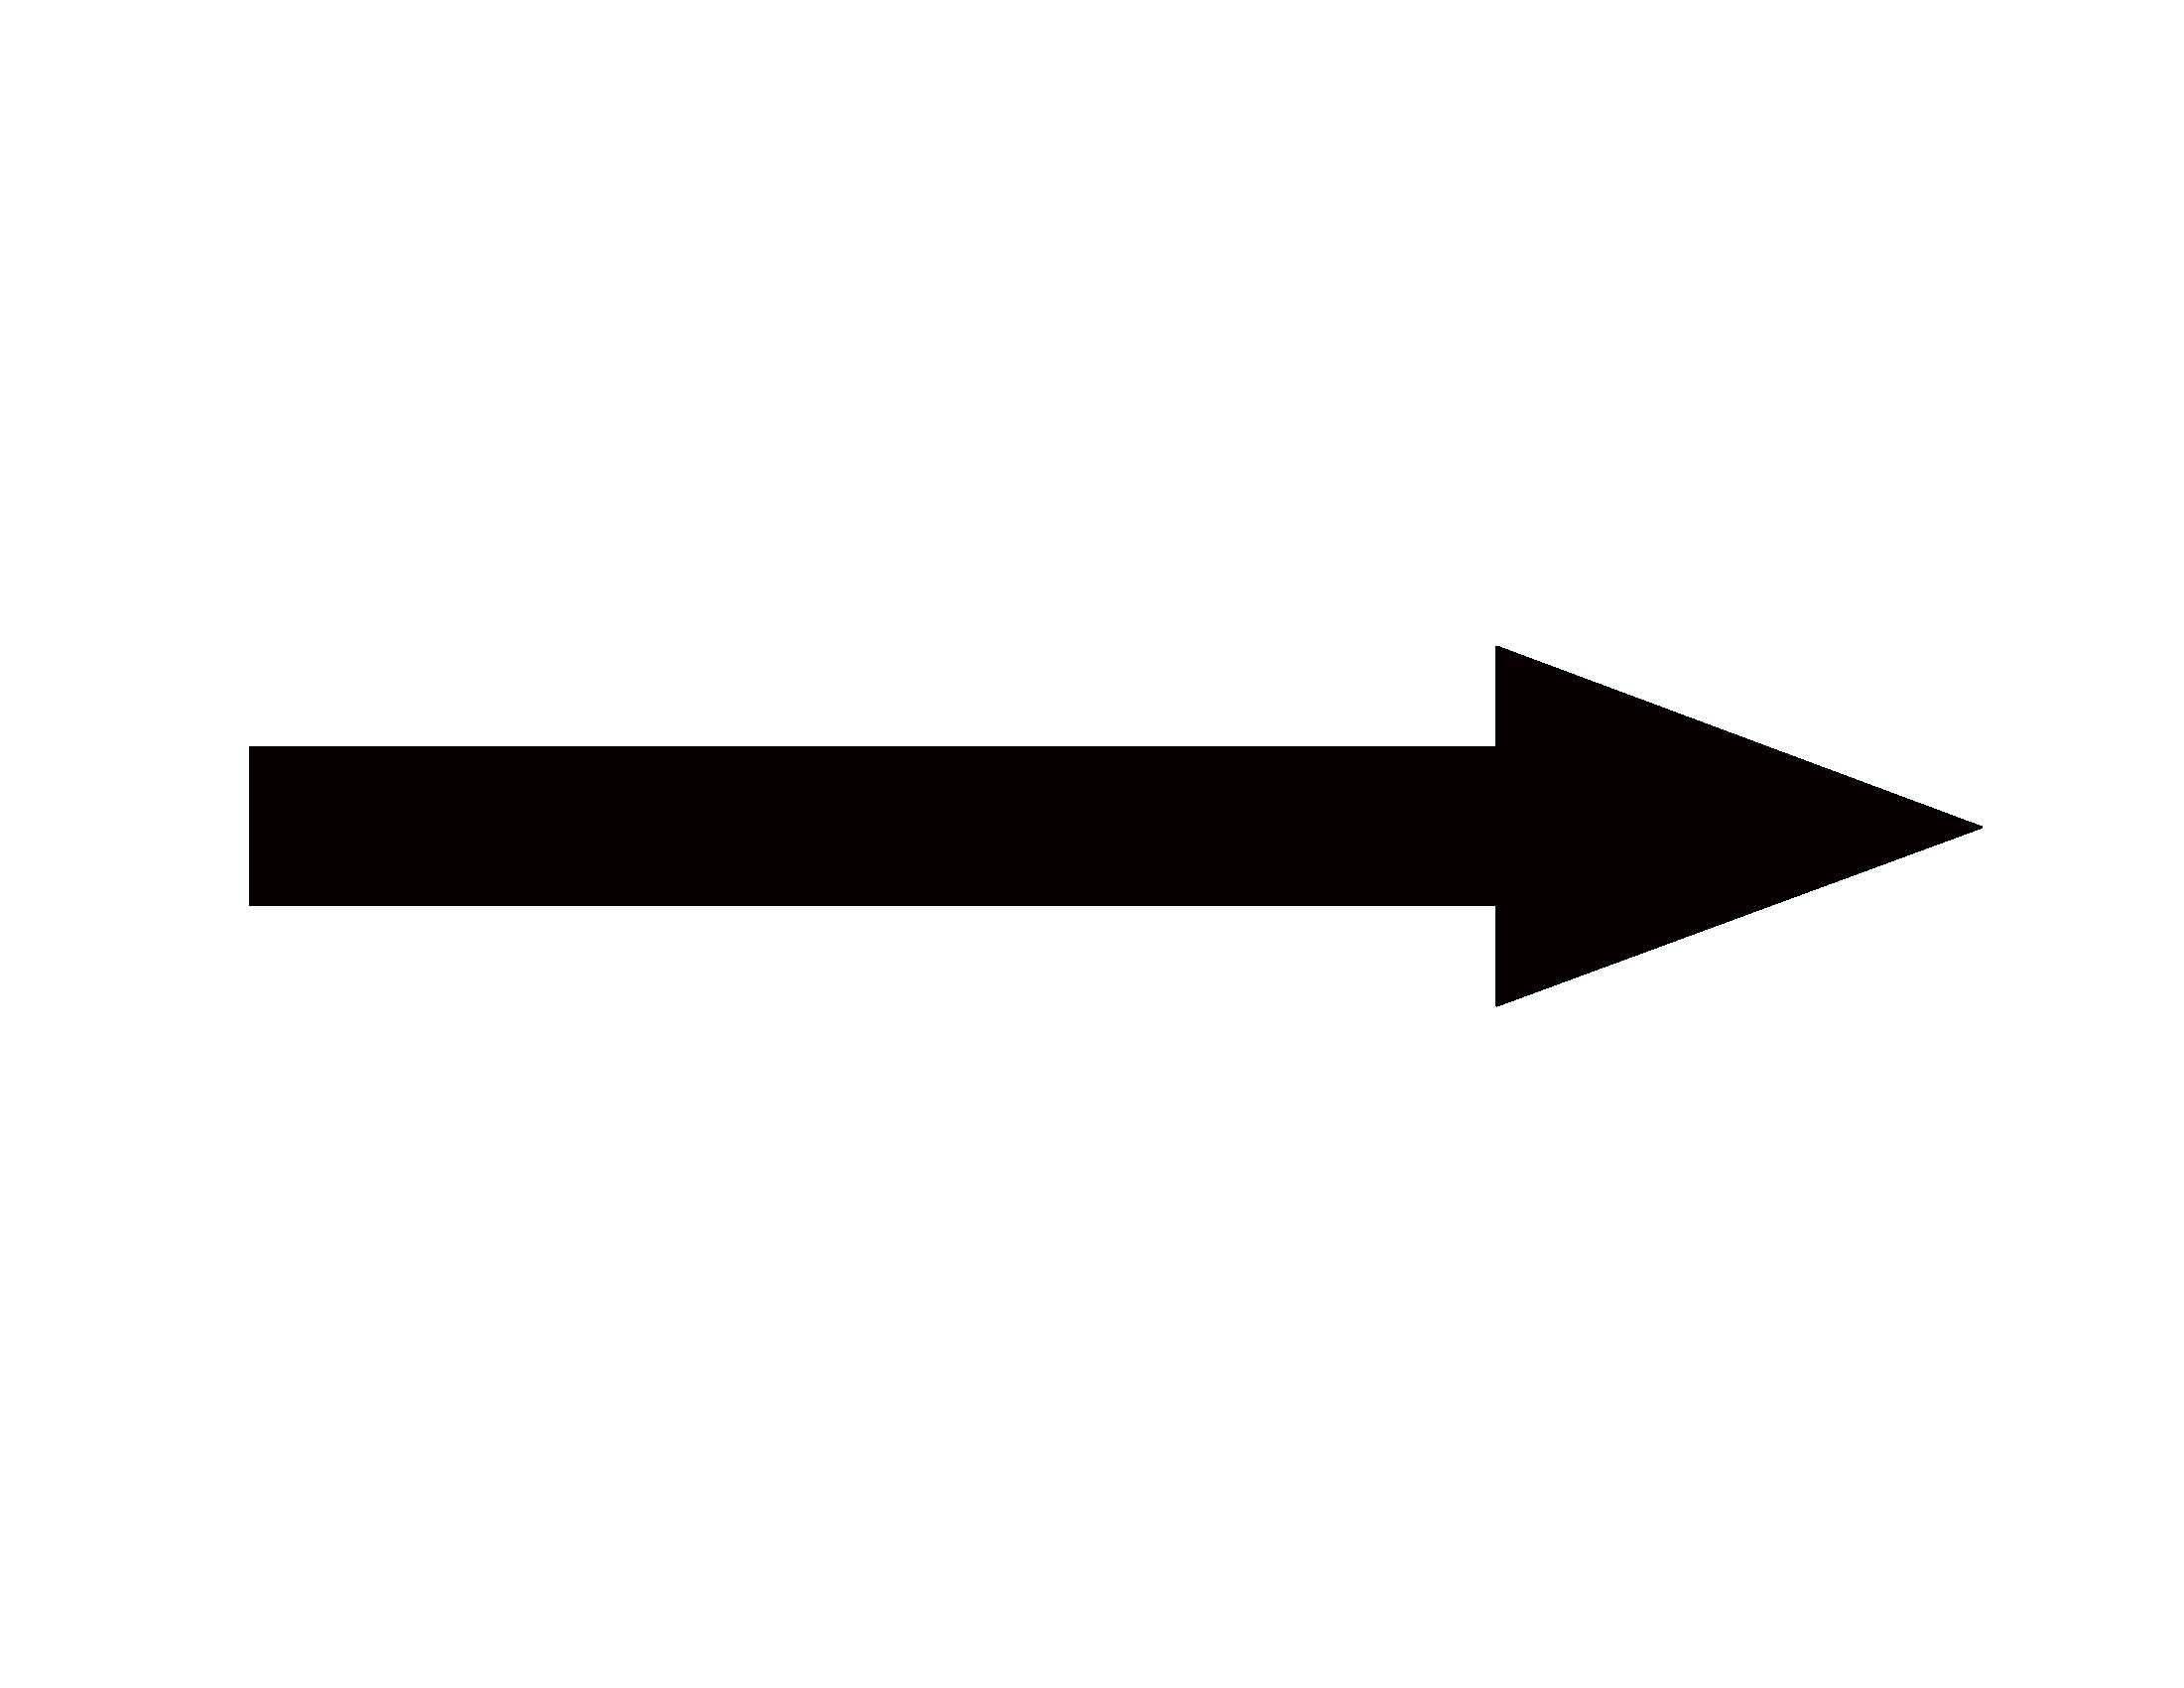 Free arrow clipart no background. Portal